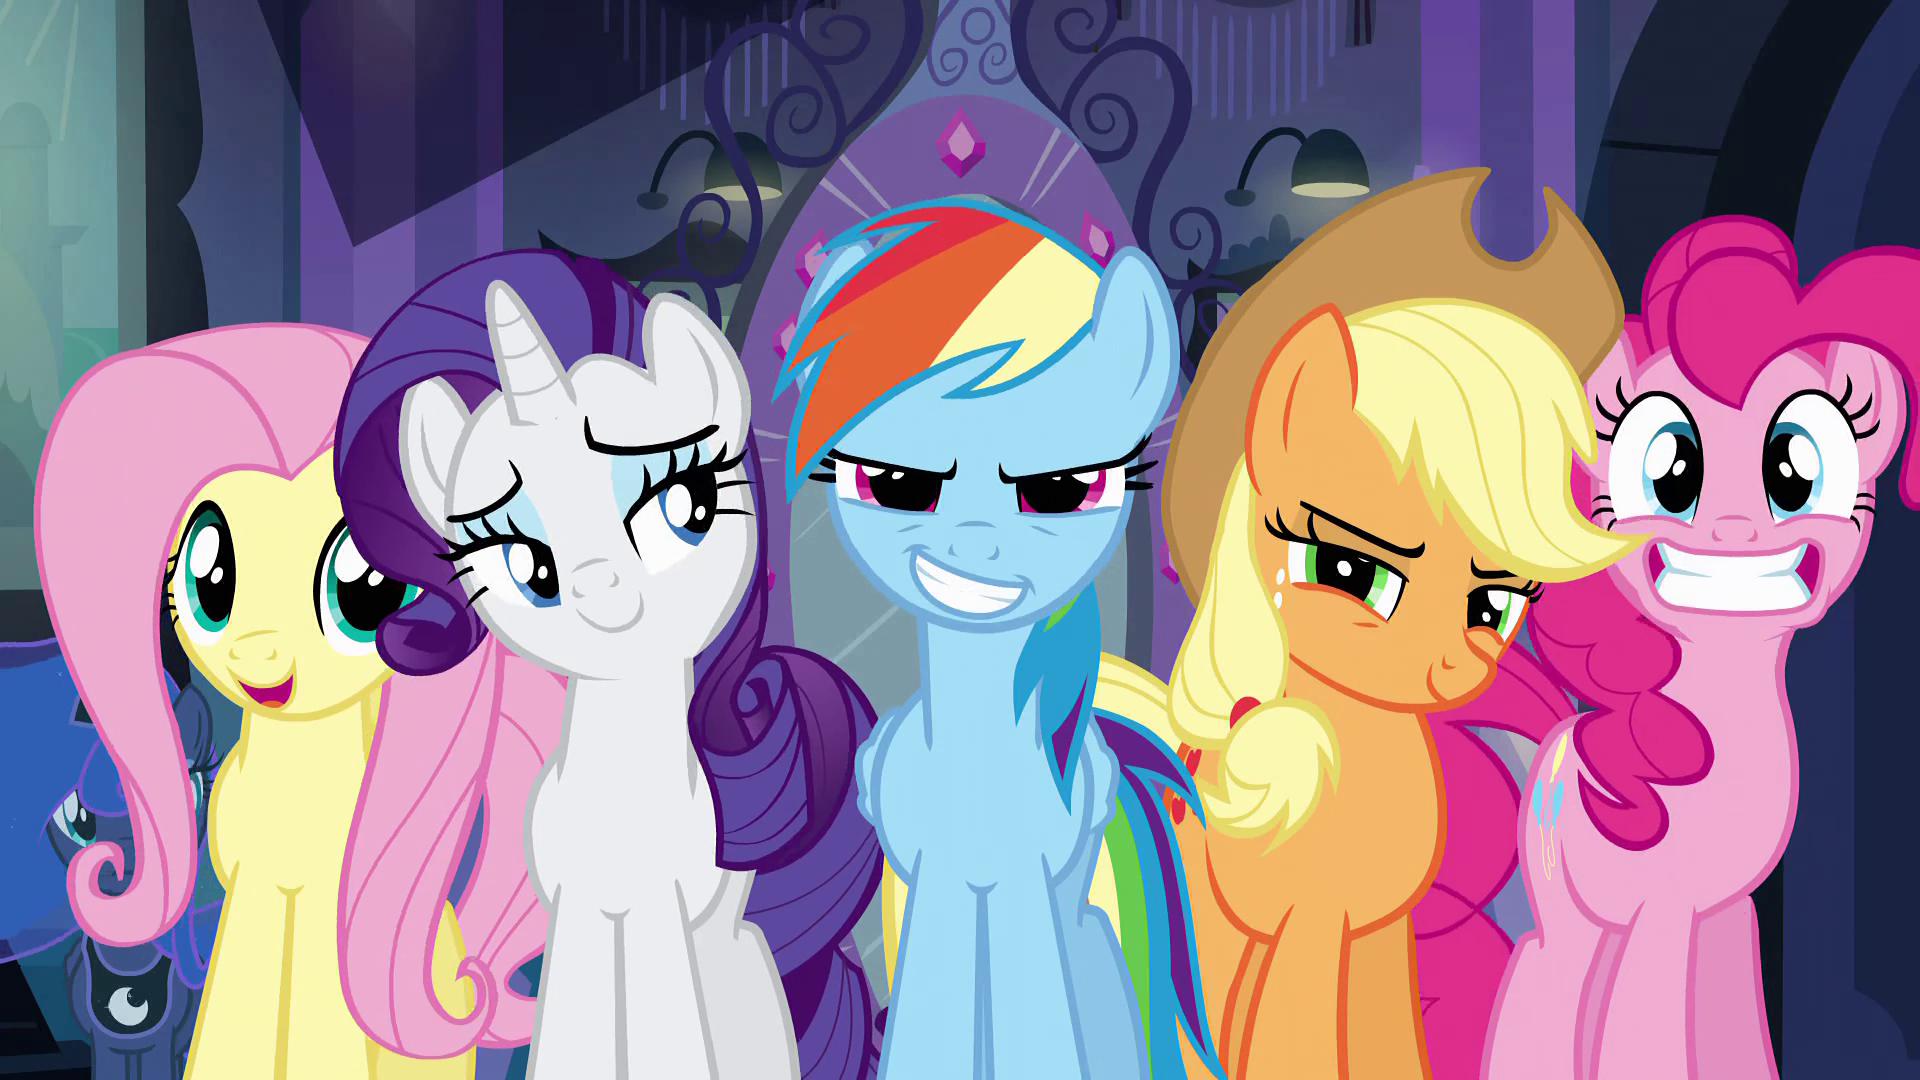 Castle Mane Ia My Little Pony Friendship Is Magic Wiki >> My Little Pony Equestria Girls Gallery My Little Pony Geekery My